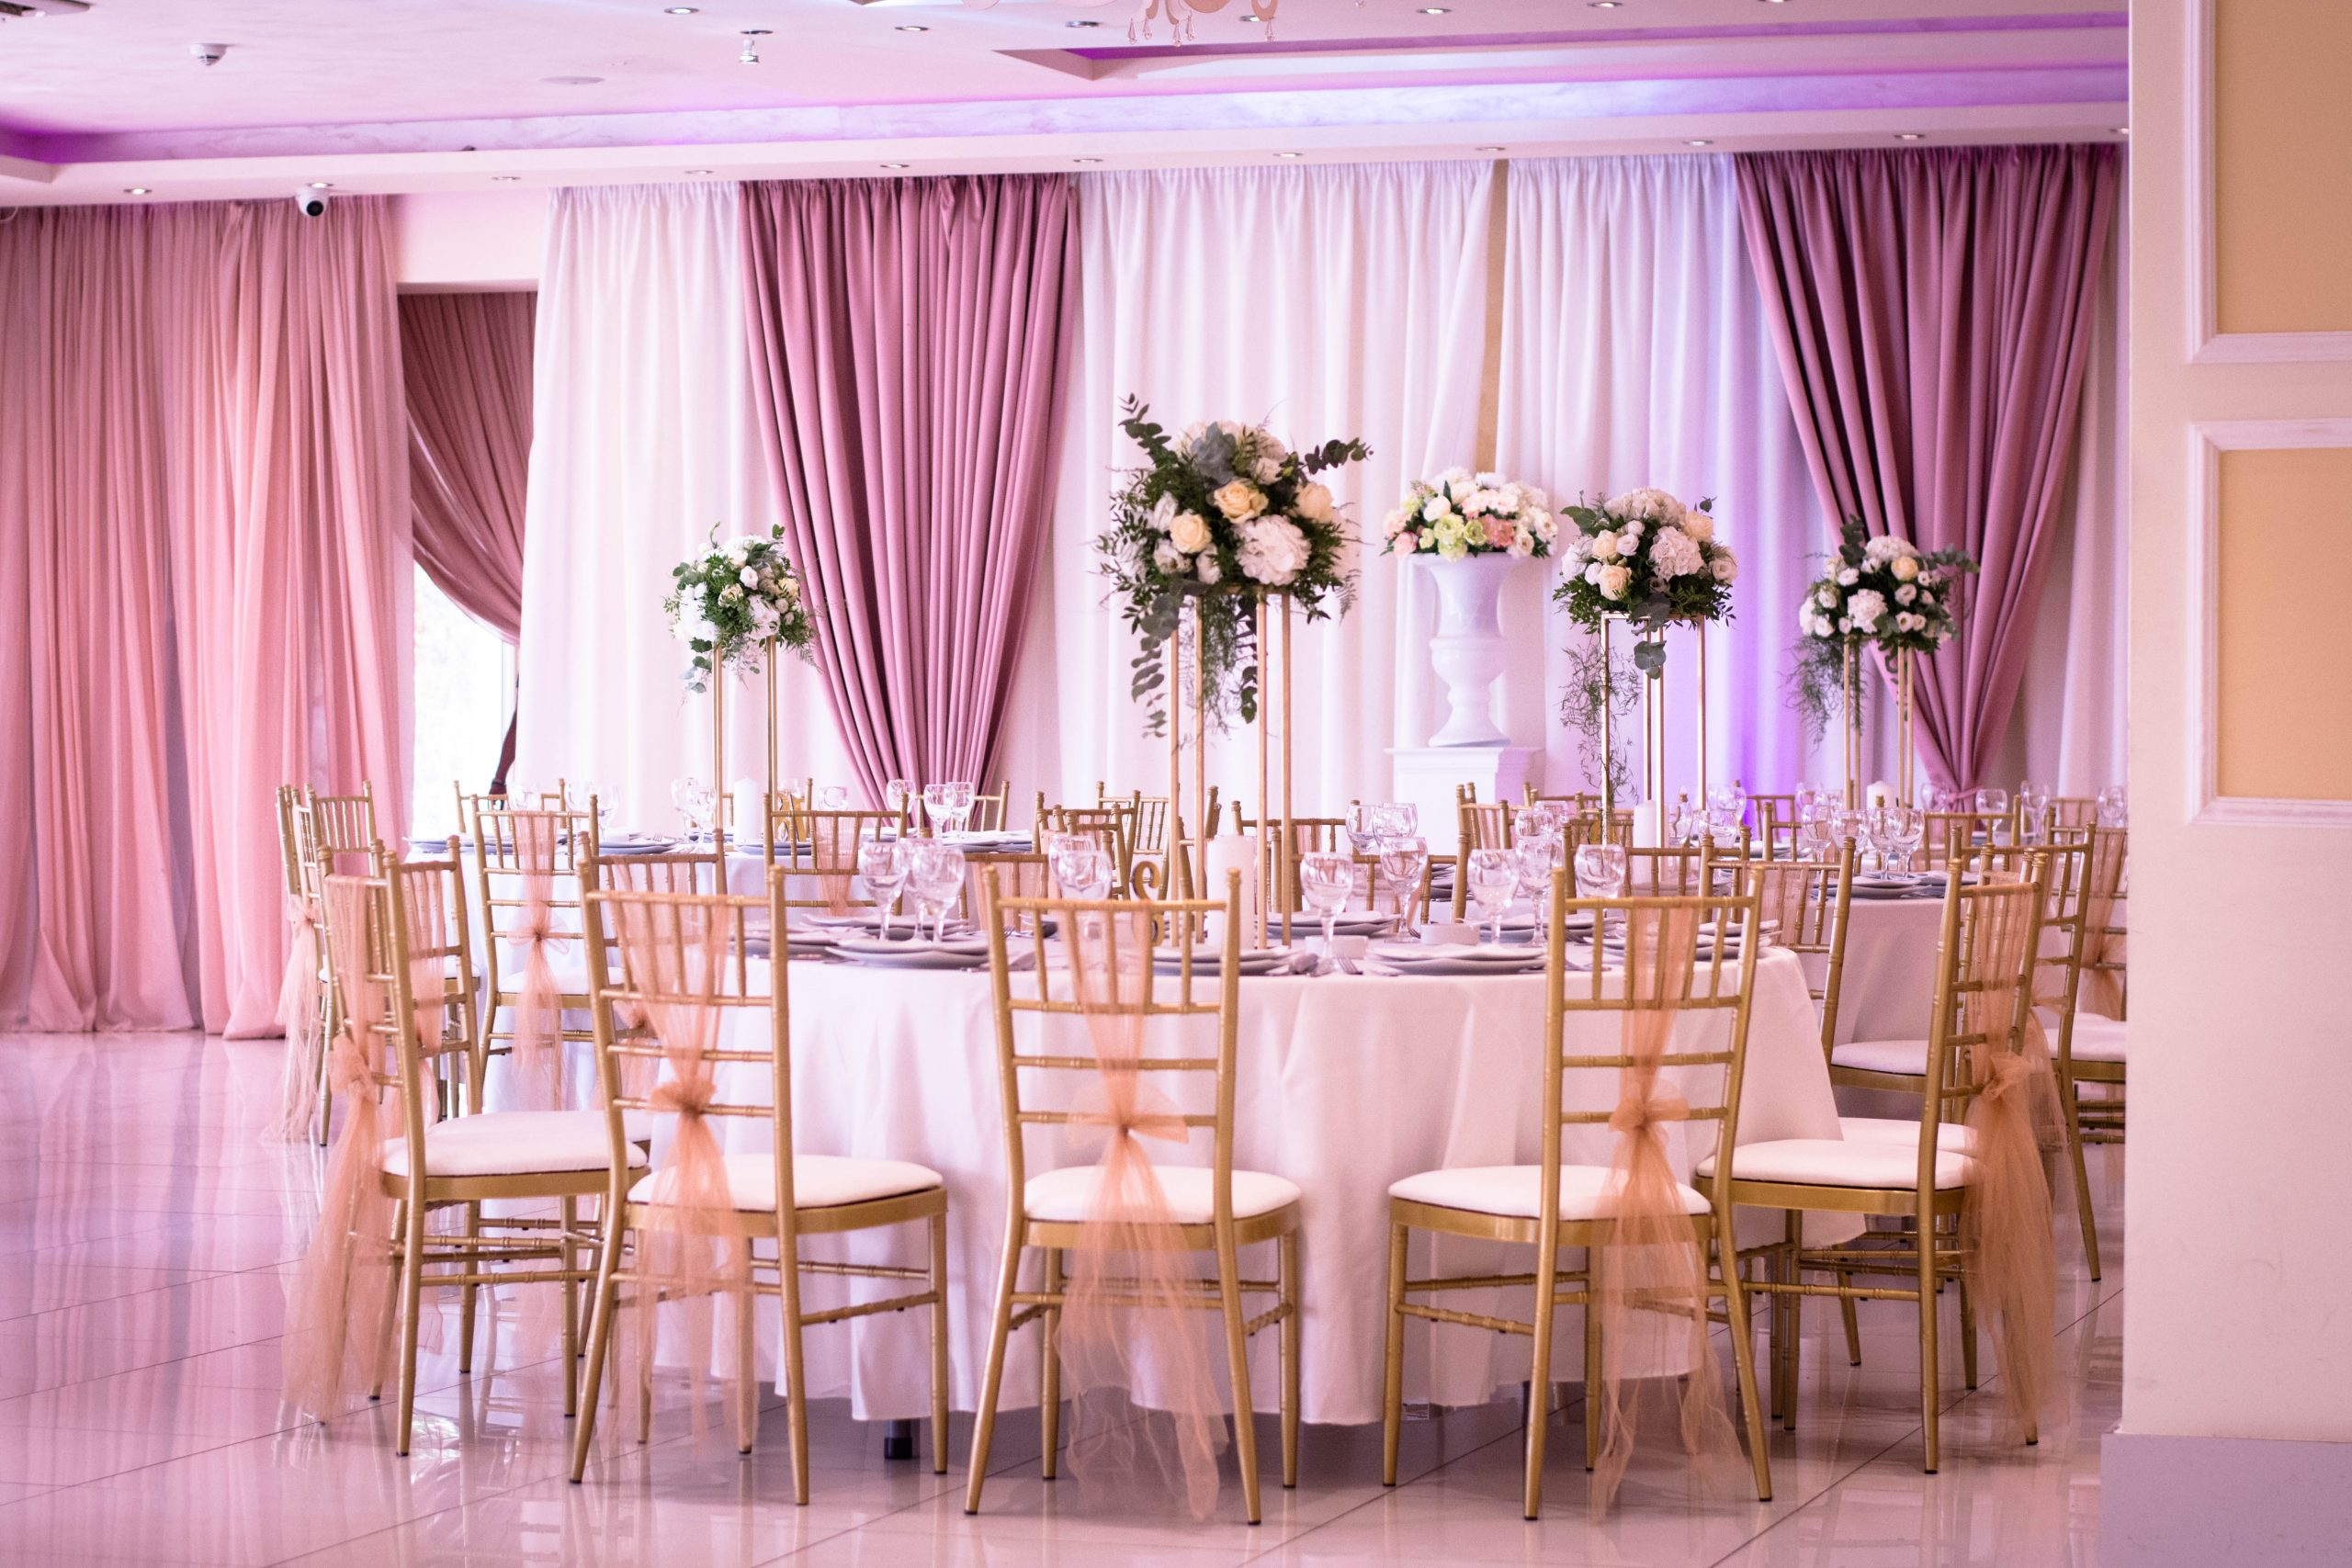 Cvetna dekoracija svadbe